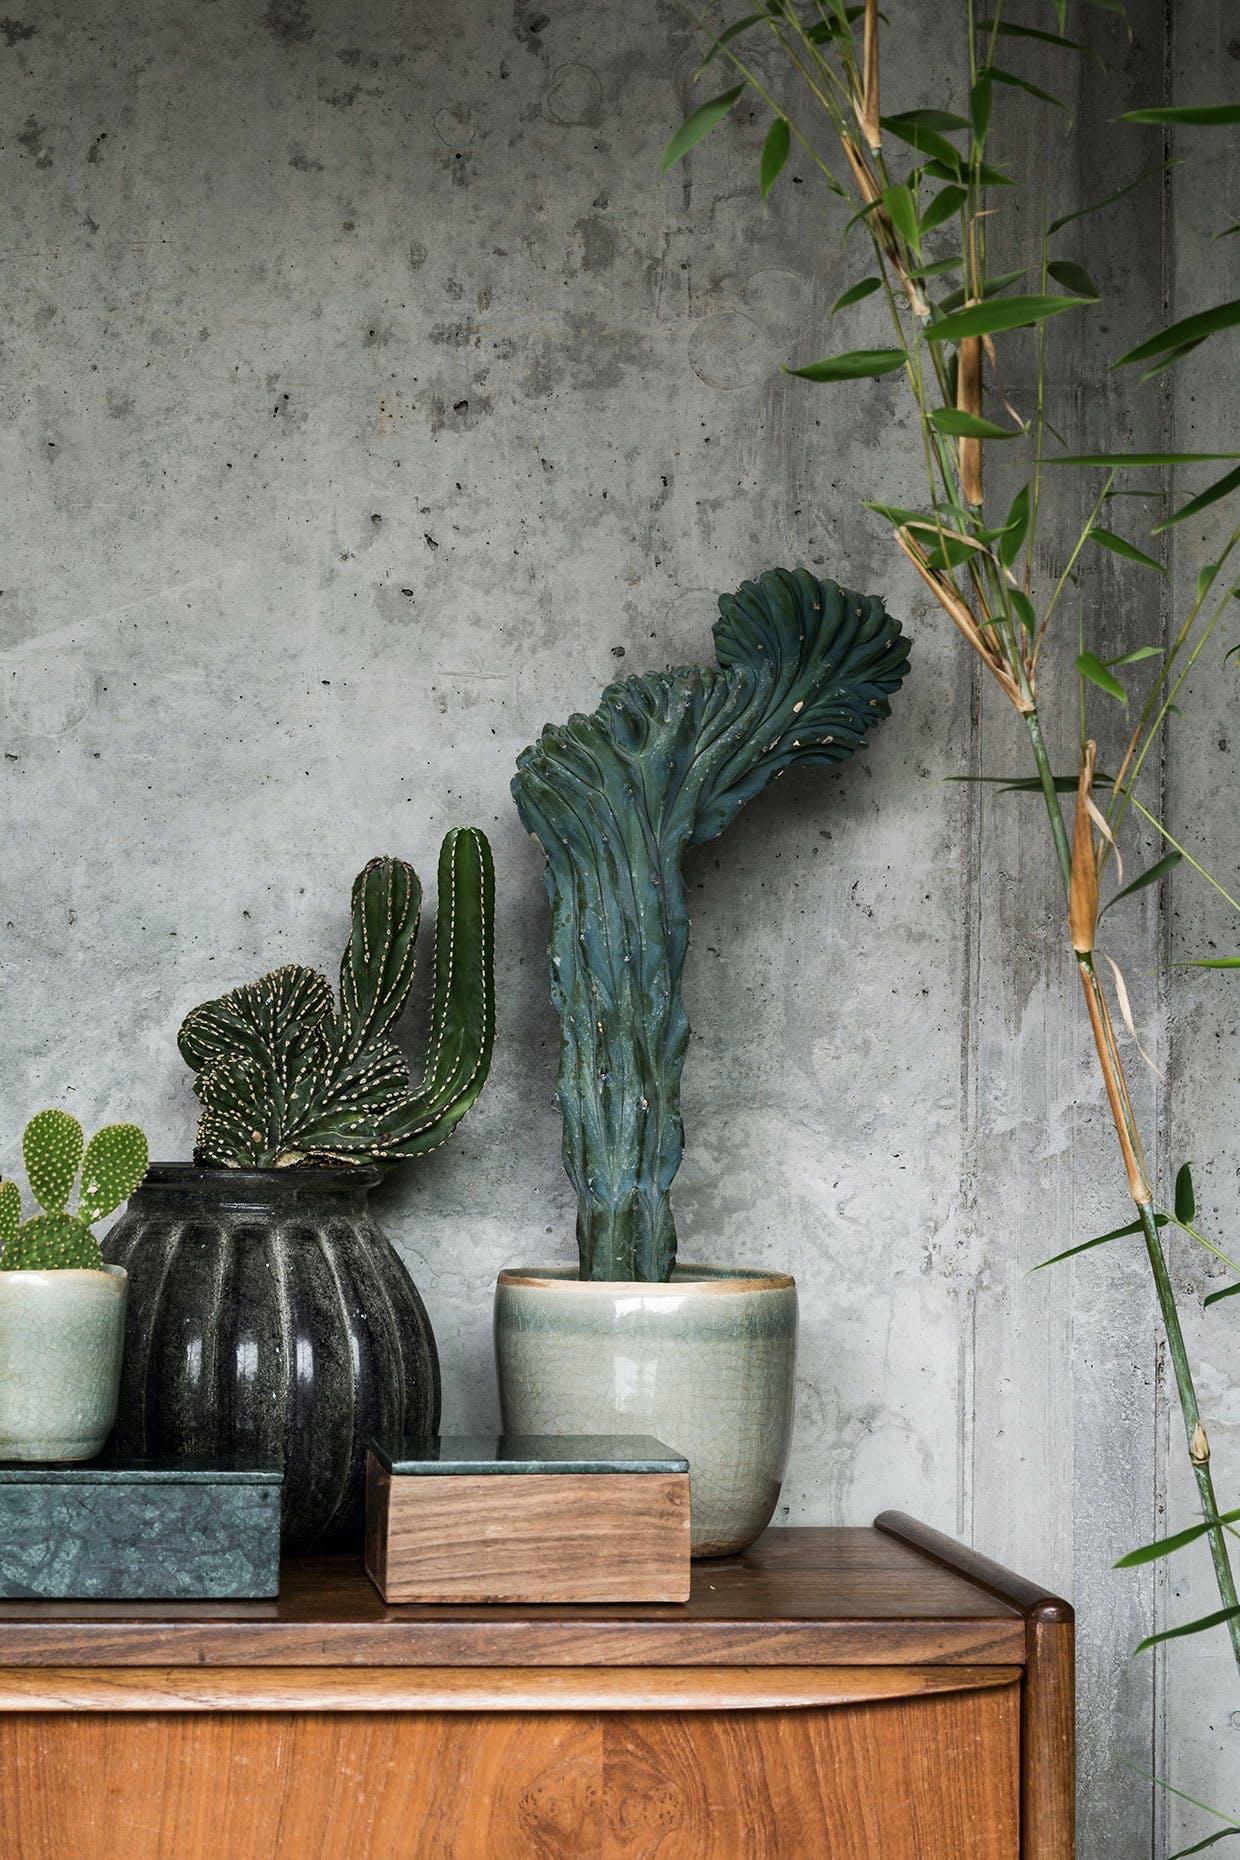 kaktus planter beton træ keramik